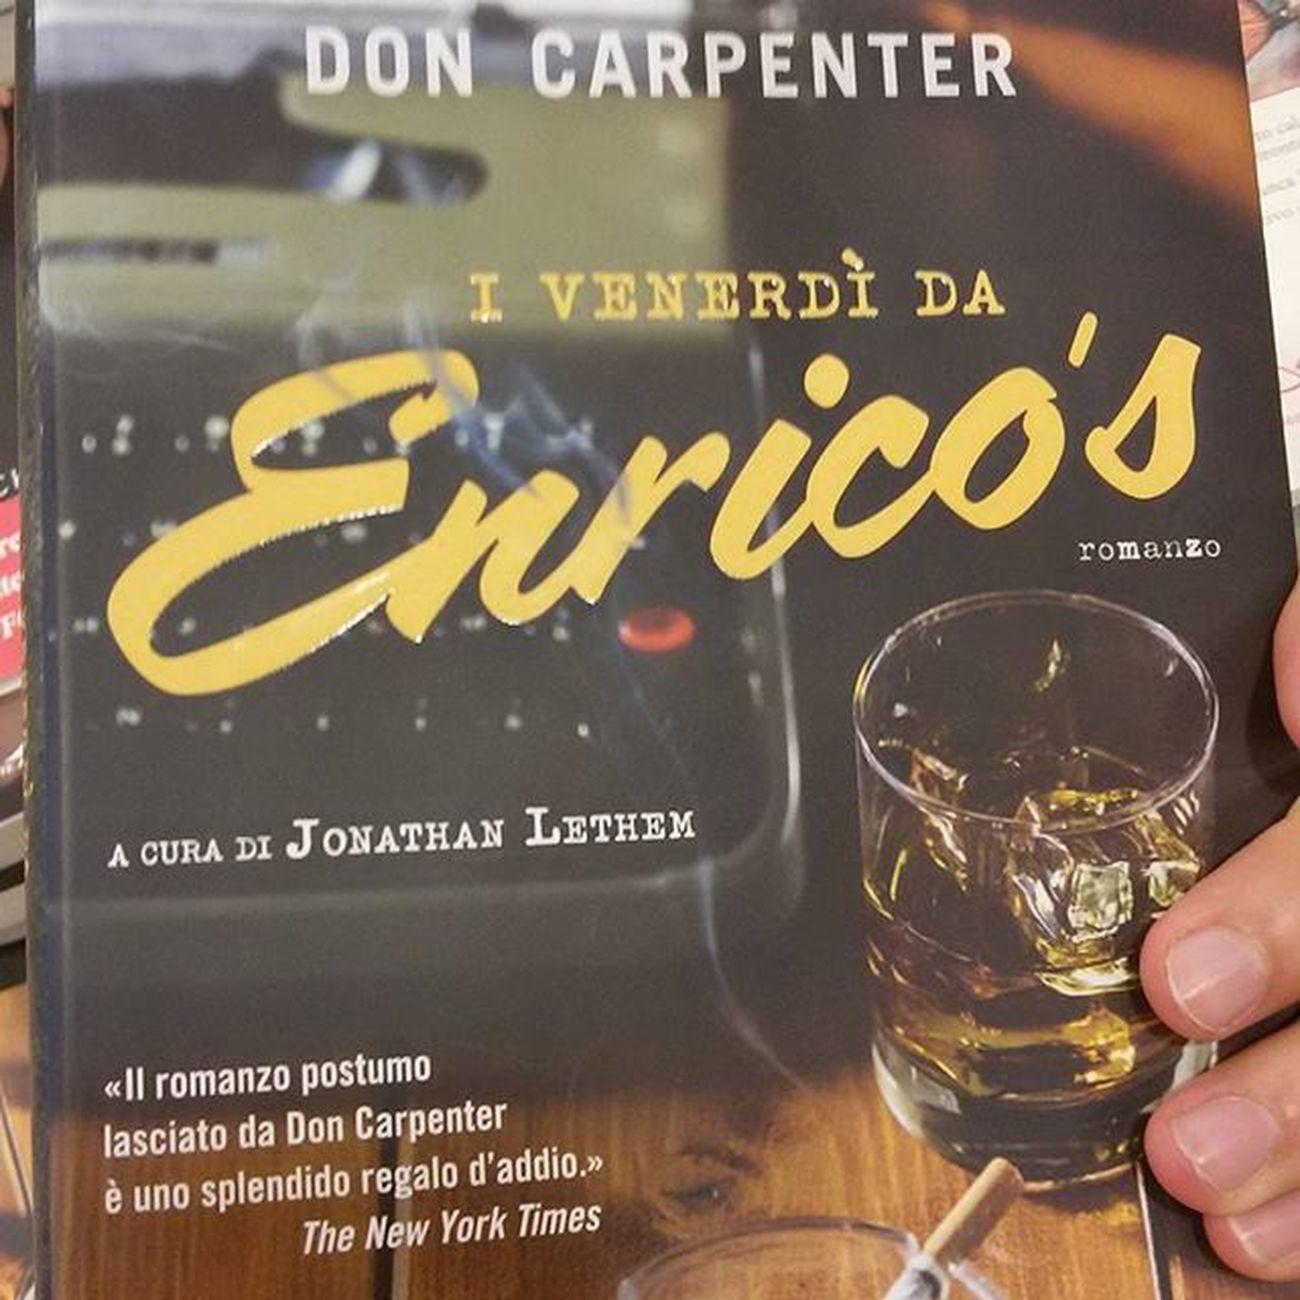 Books Stateofmind Doncarpenter Enricos Romanzo Feltrinelli